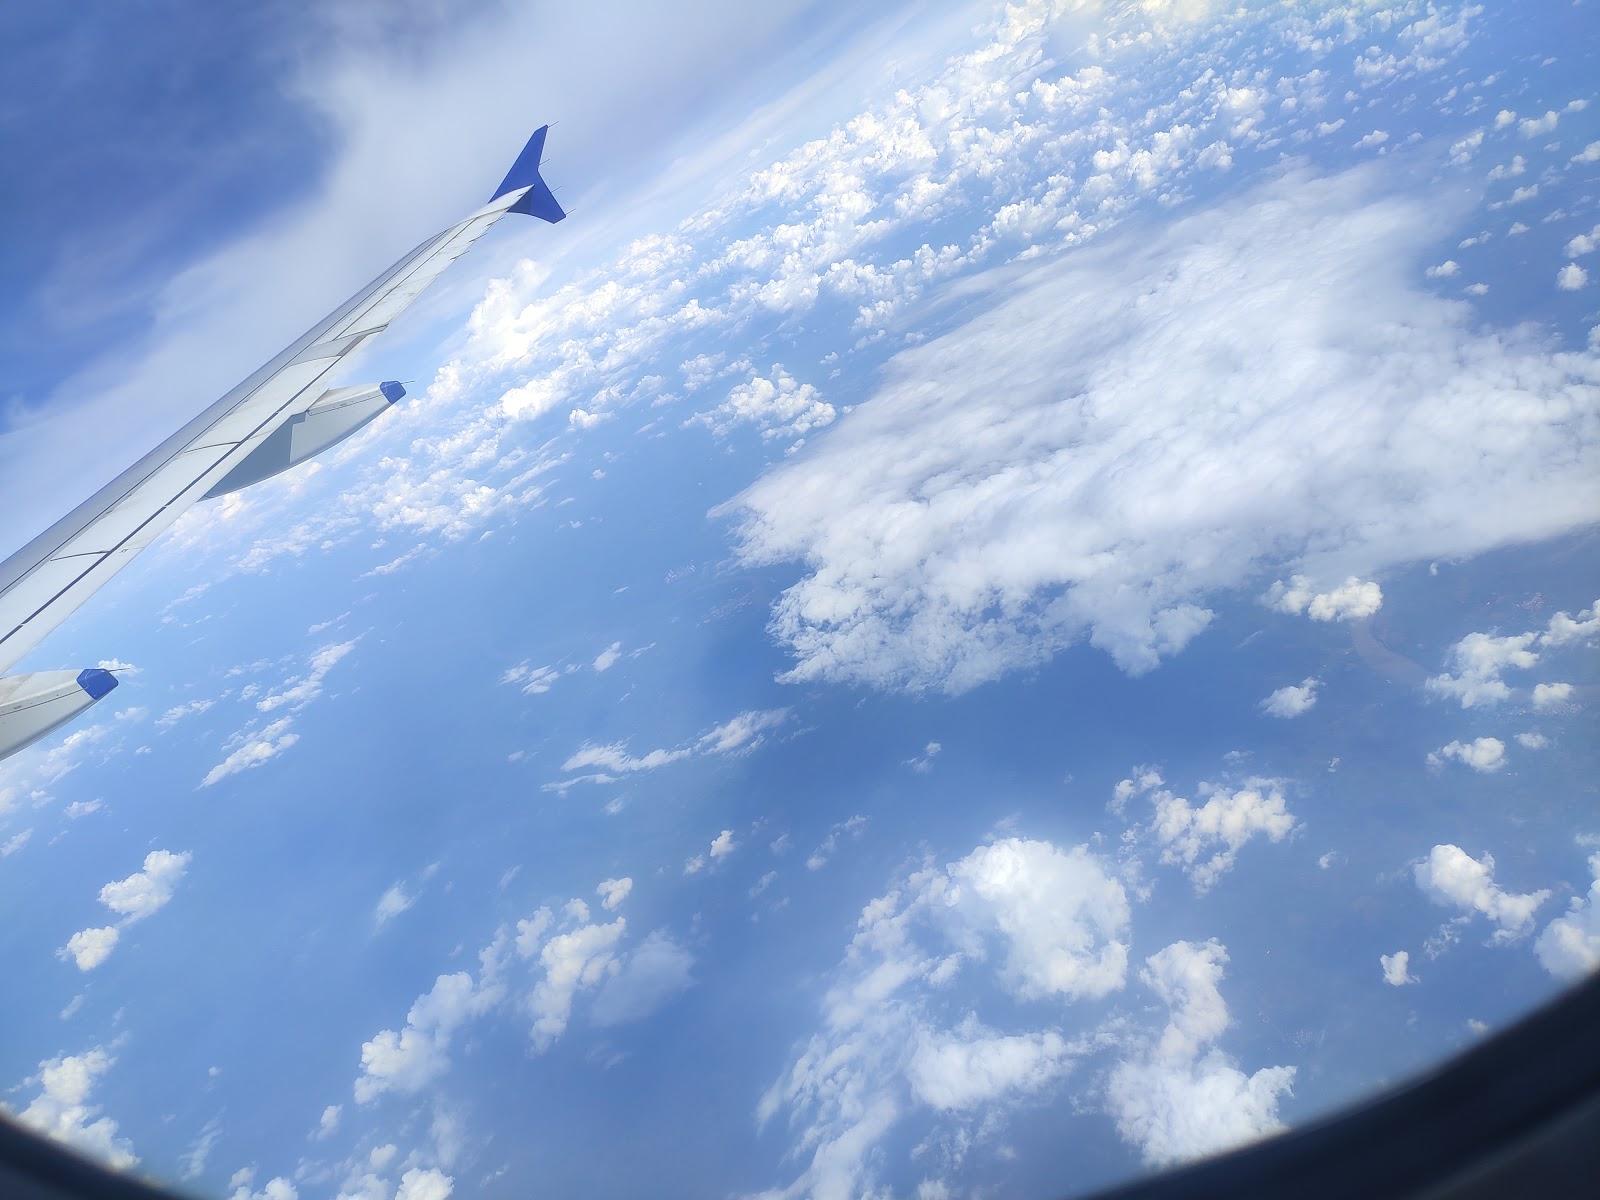 Madhosh Kiye Jaa: Poha in Flight